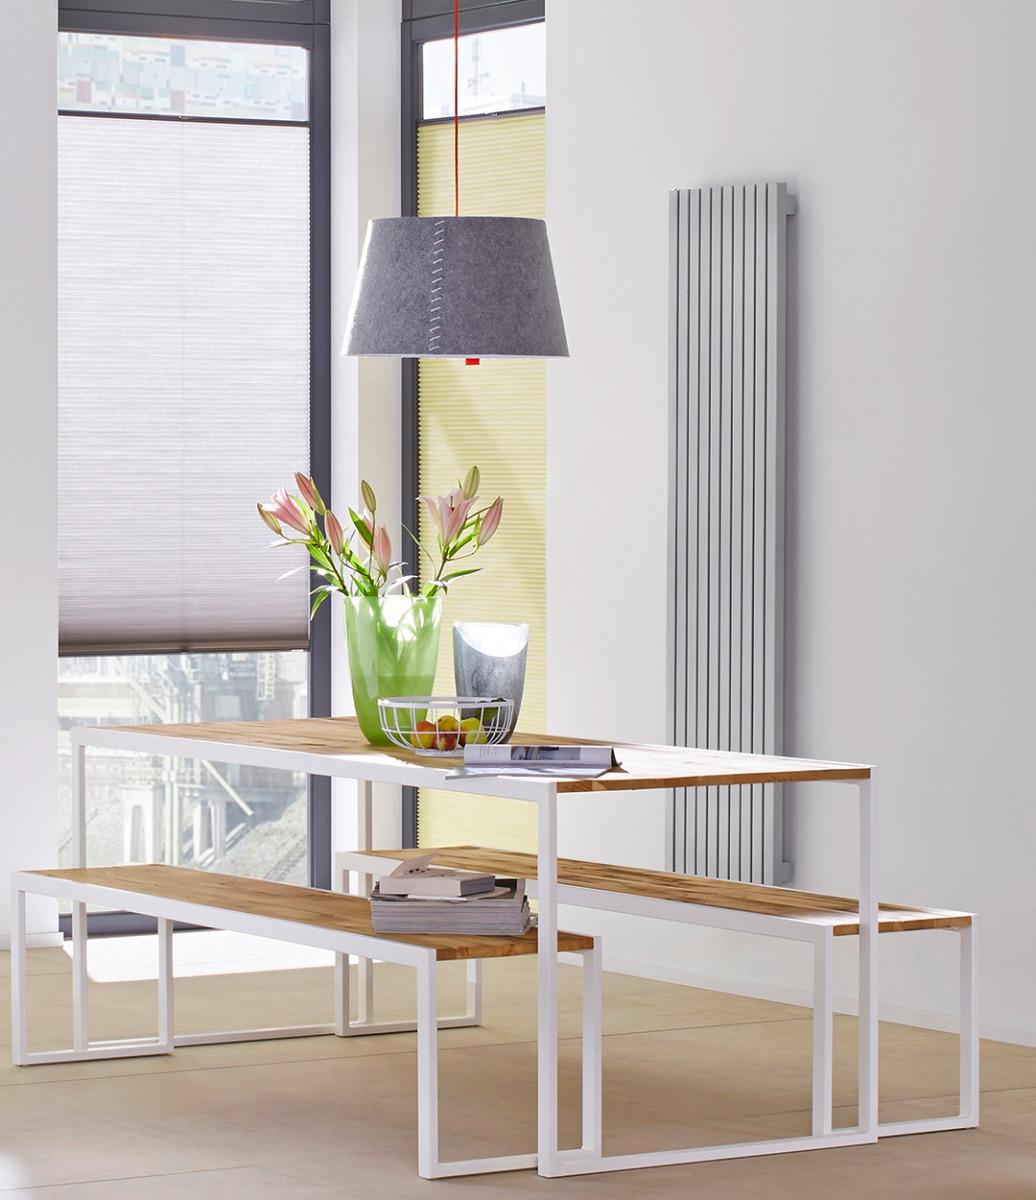 Moree Alice 50 LED HanglampØ50x30 Cm - Grijs